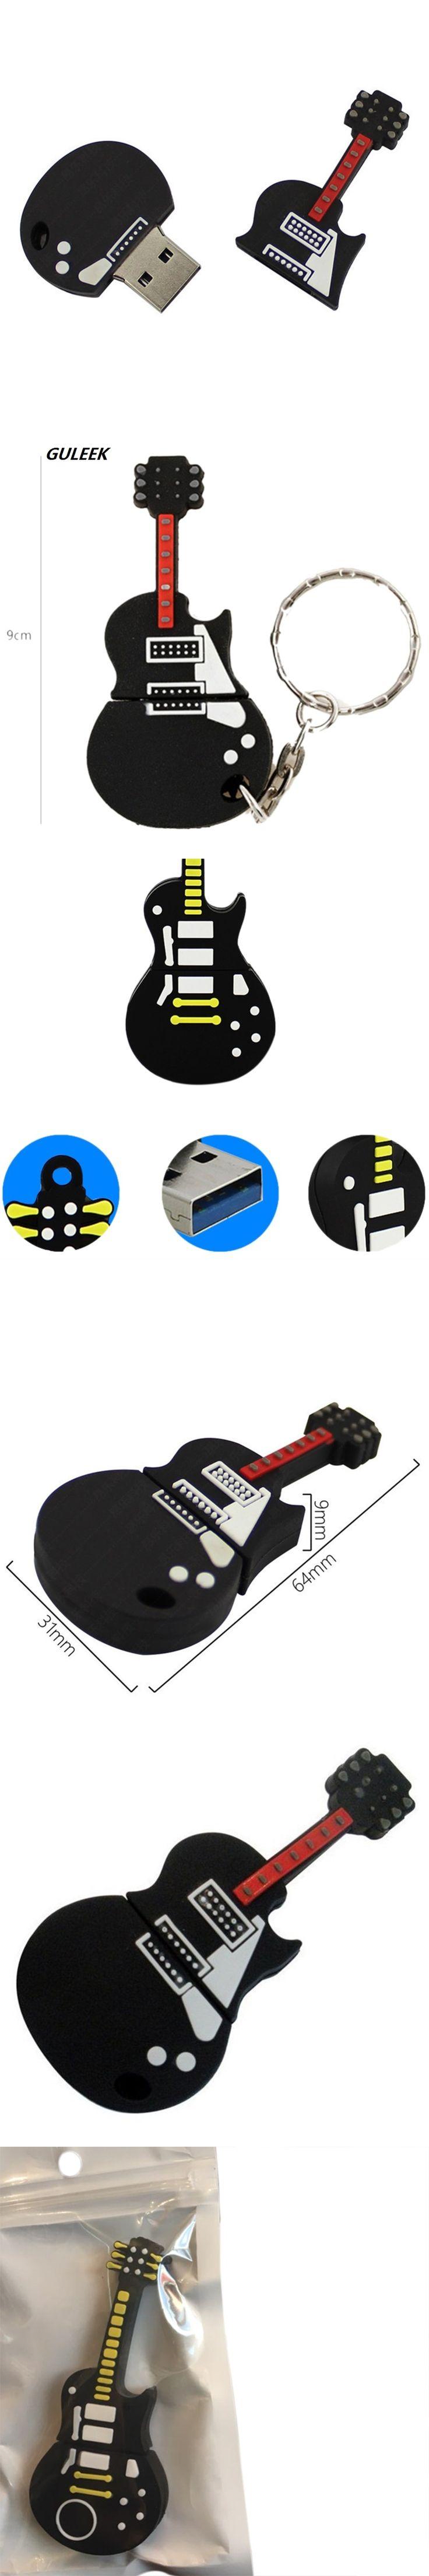 Guitar Design USB 2.0 Flash Drives 4GB/8GB/16GB Keychain Memory 5600MB/s PVC Classic Design USB Gadget 6.4*3.1*0.9CM